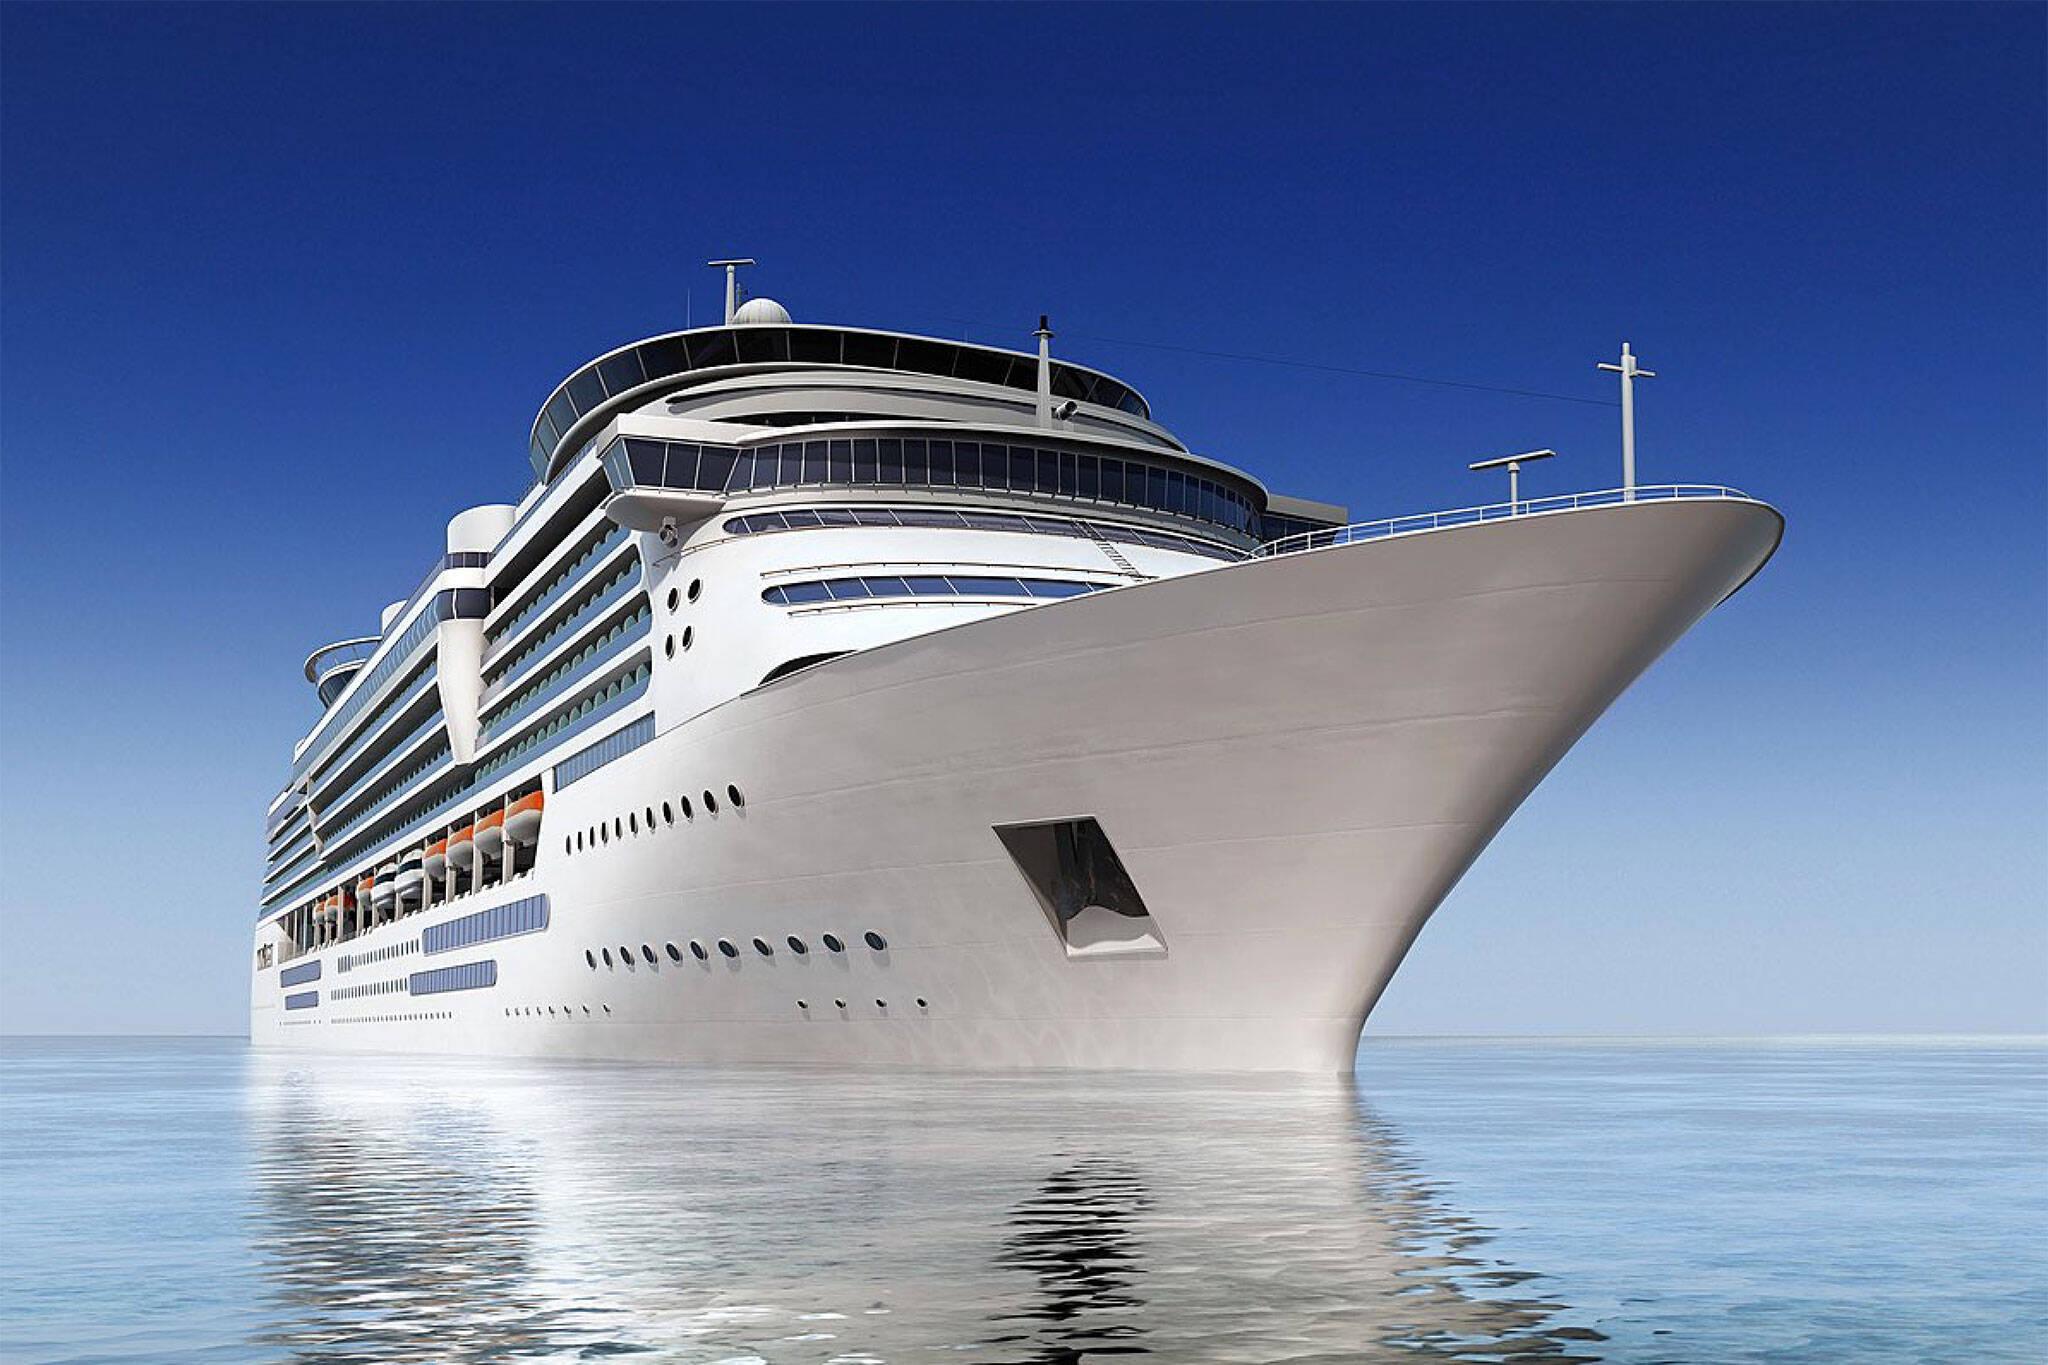 port colborne cruise ships